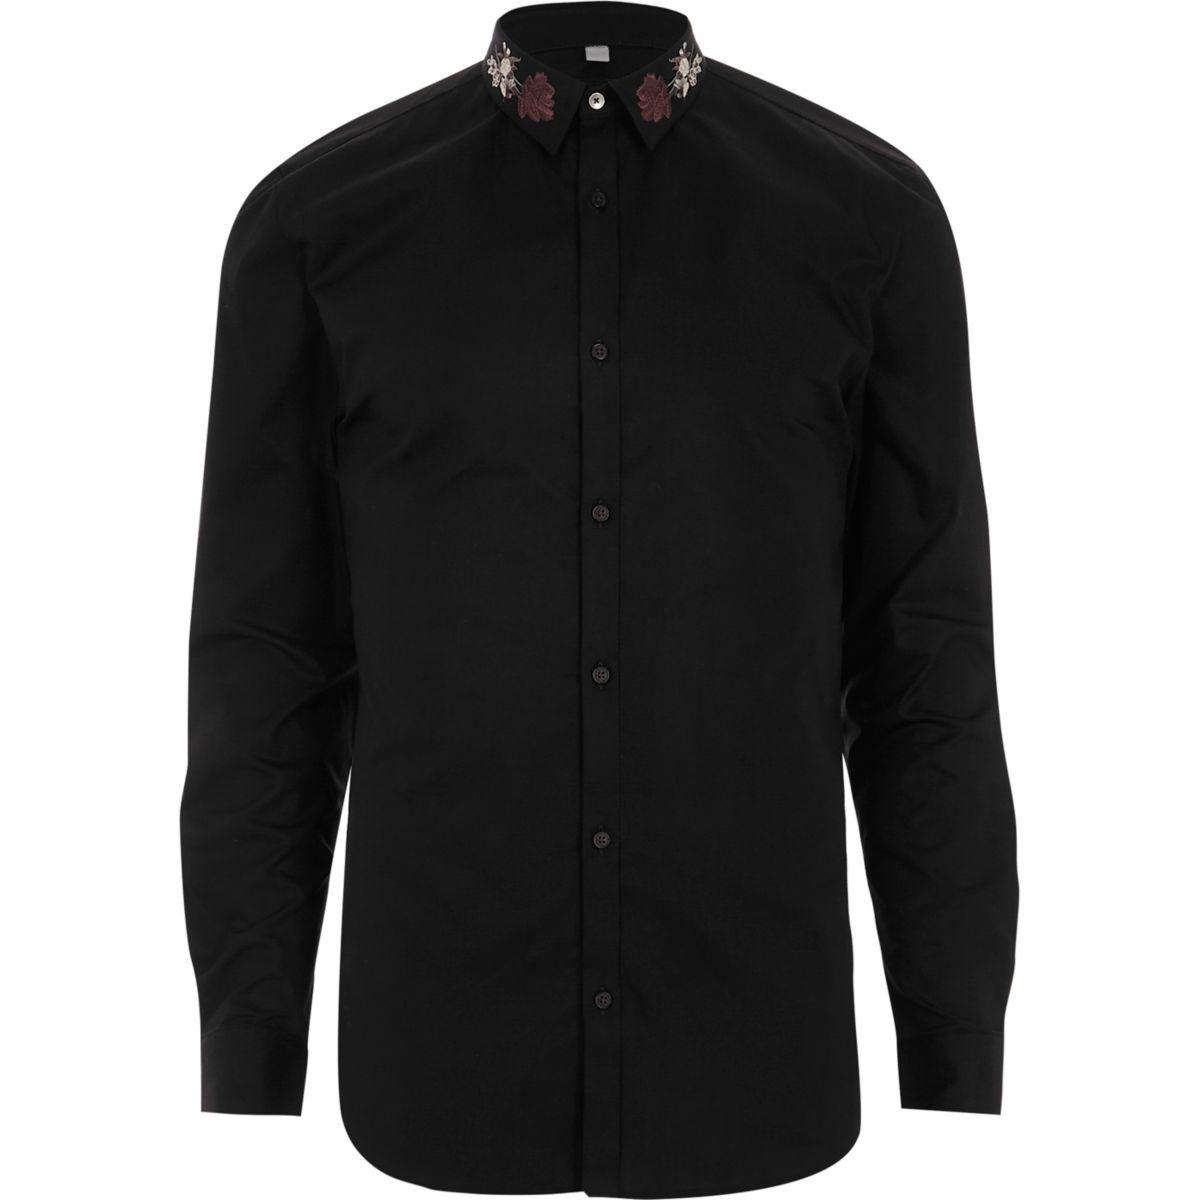 Schwarzes, verziertes Muscle Fit Hemd